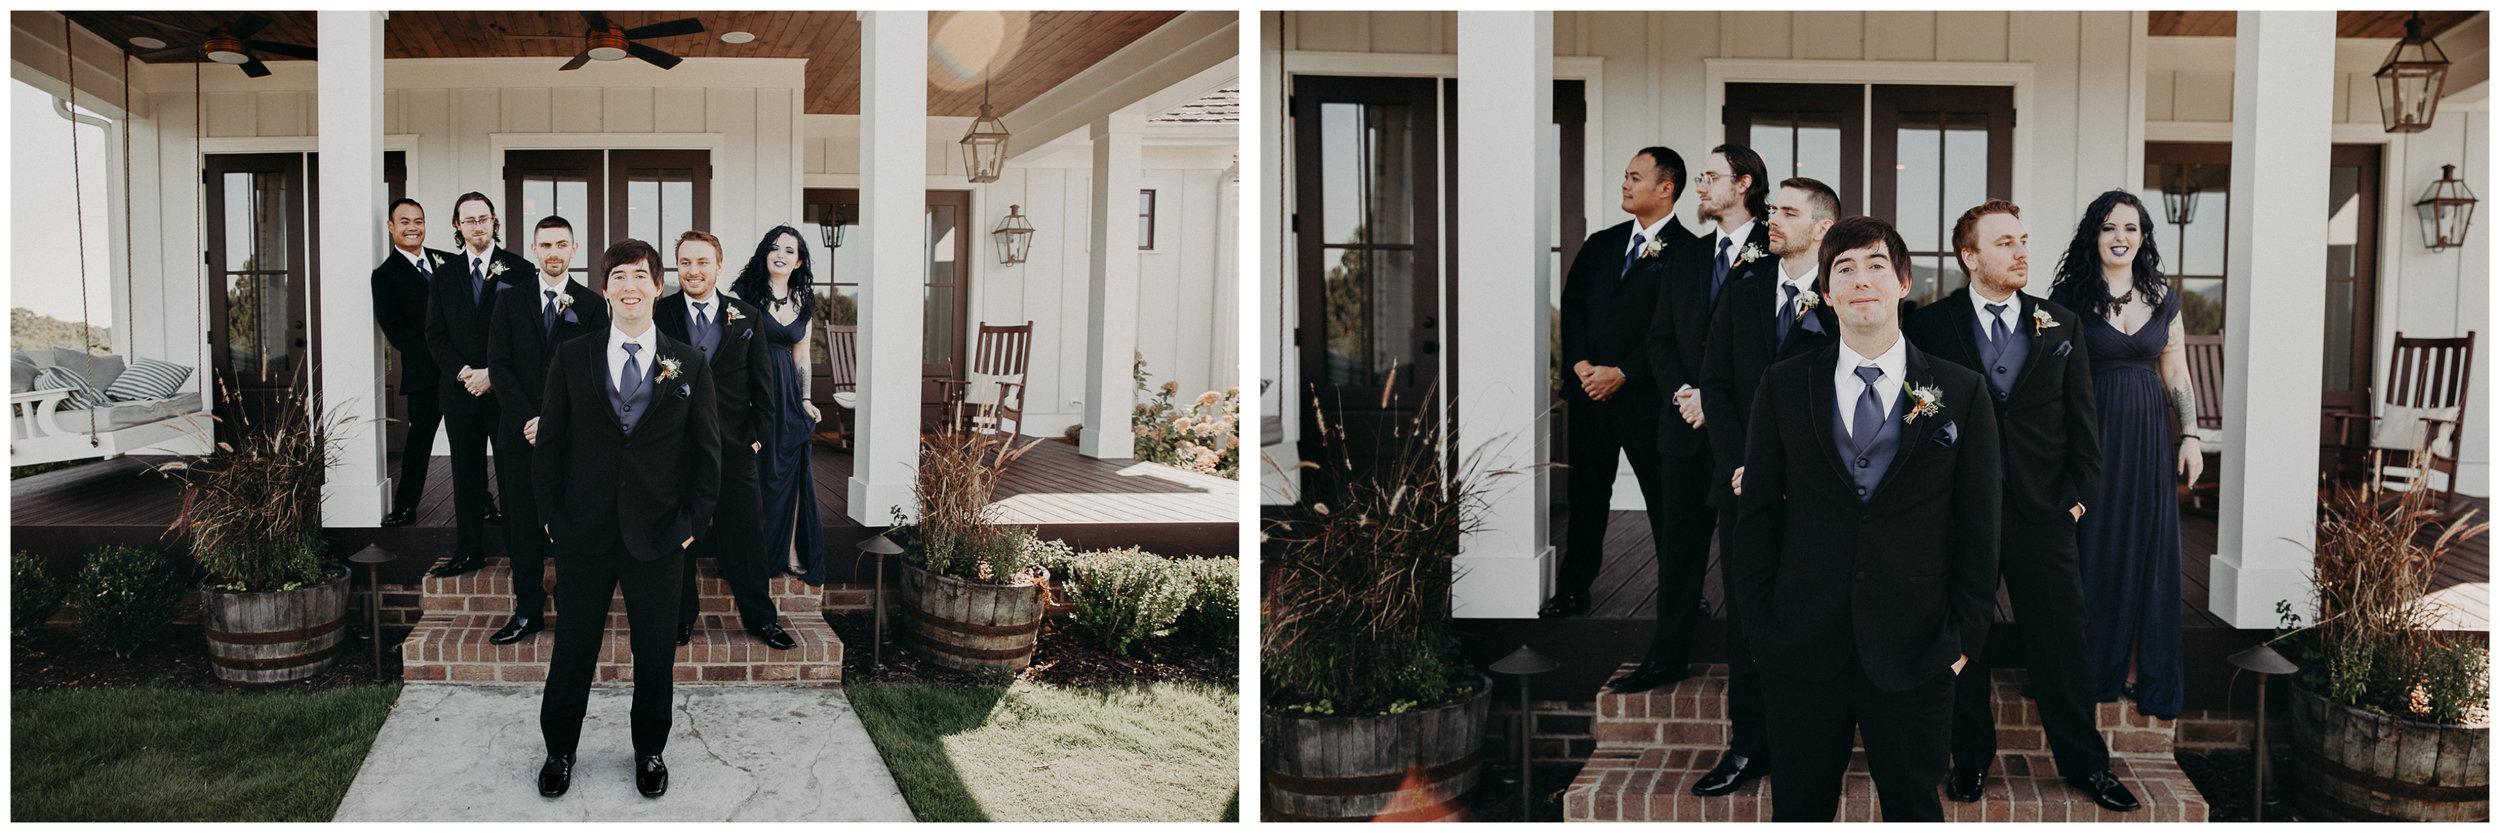 28- Wedding_day_atlanta_georgia_groom_portraits_aline_marin_photography.jpg